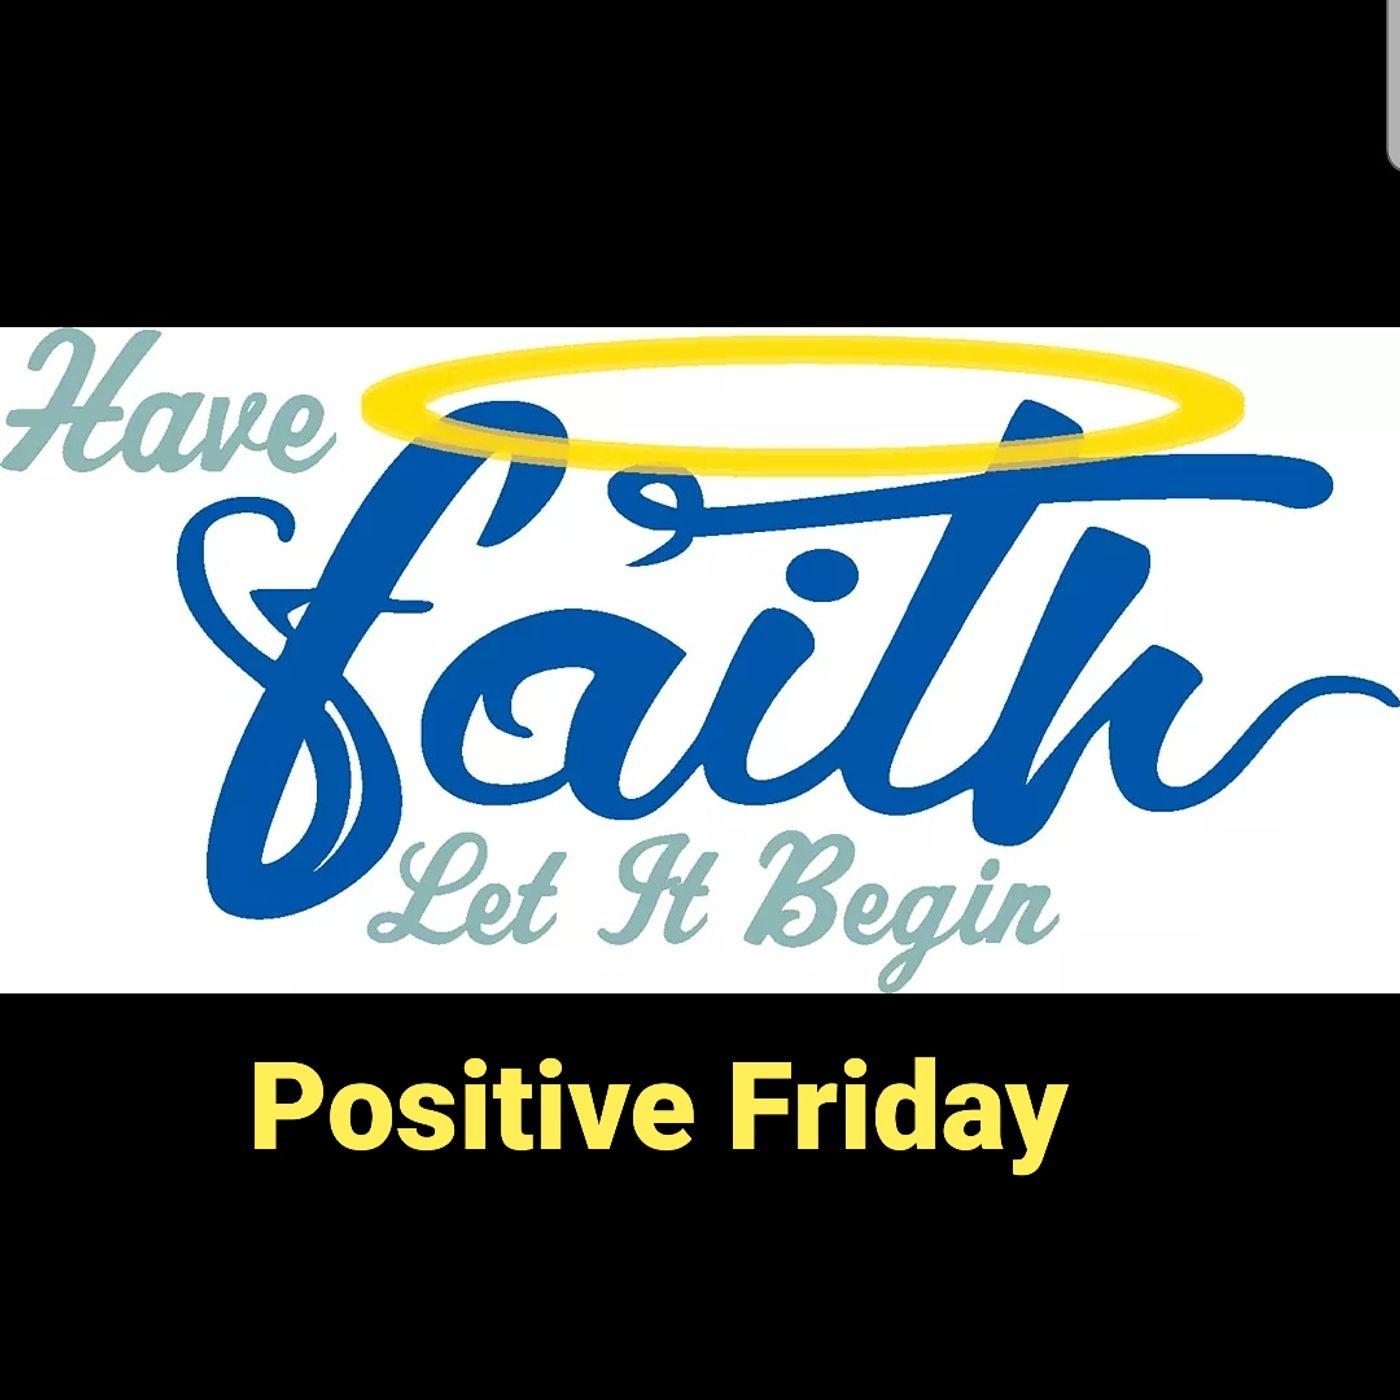 Positive Friday